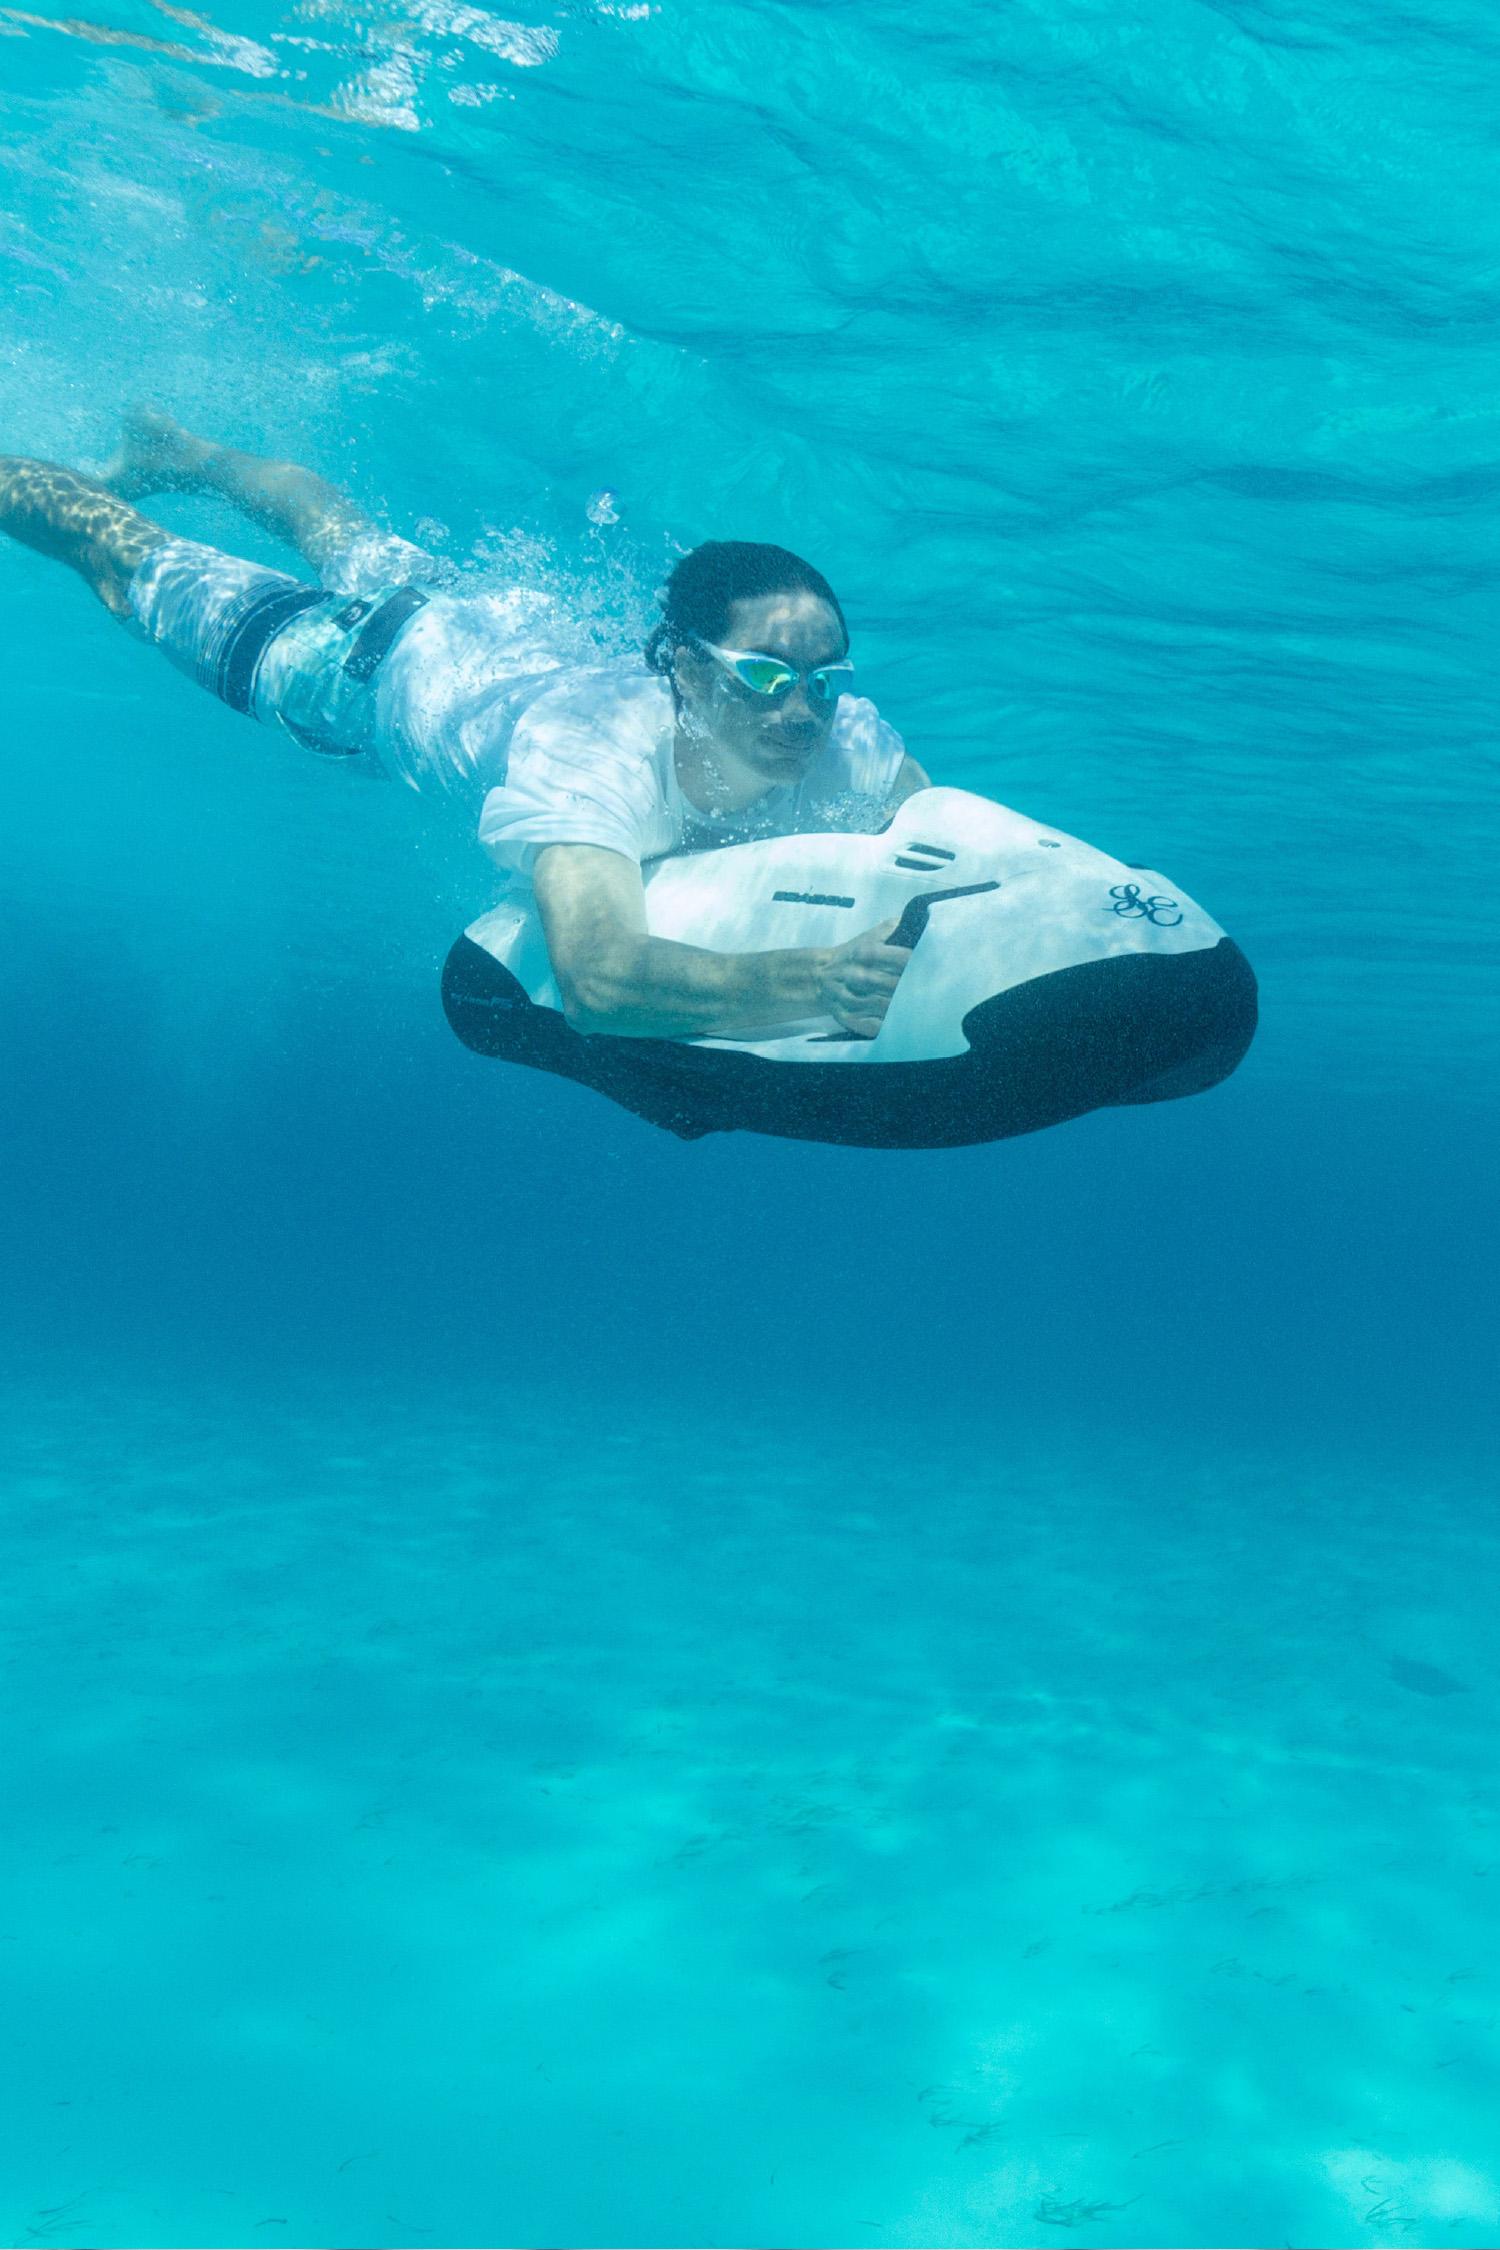 Charter-Sweet-Escape-Seabob-Underwater.jpg